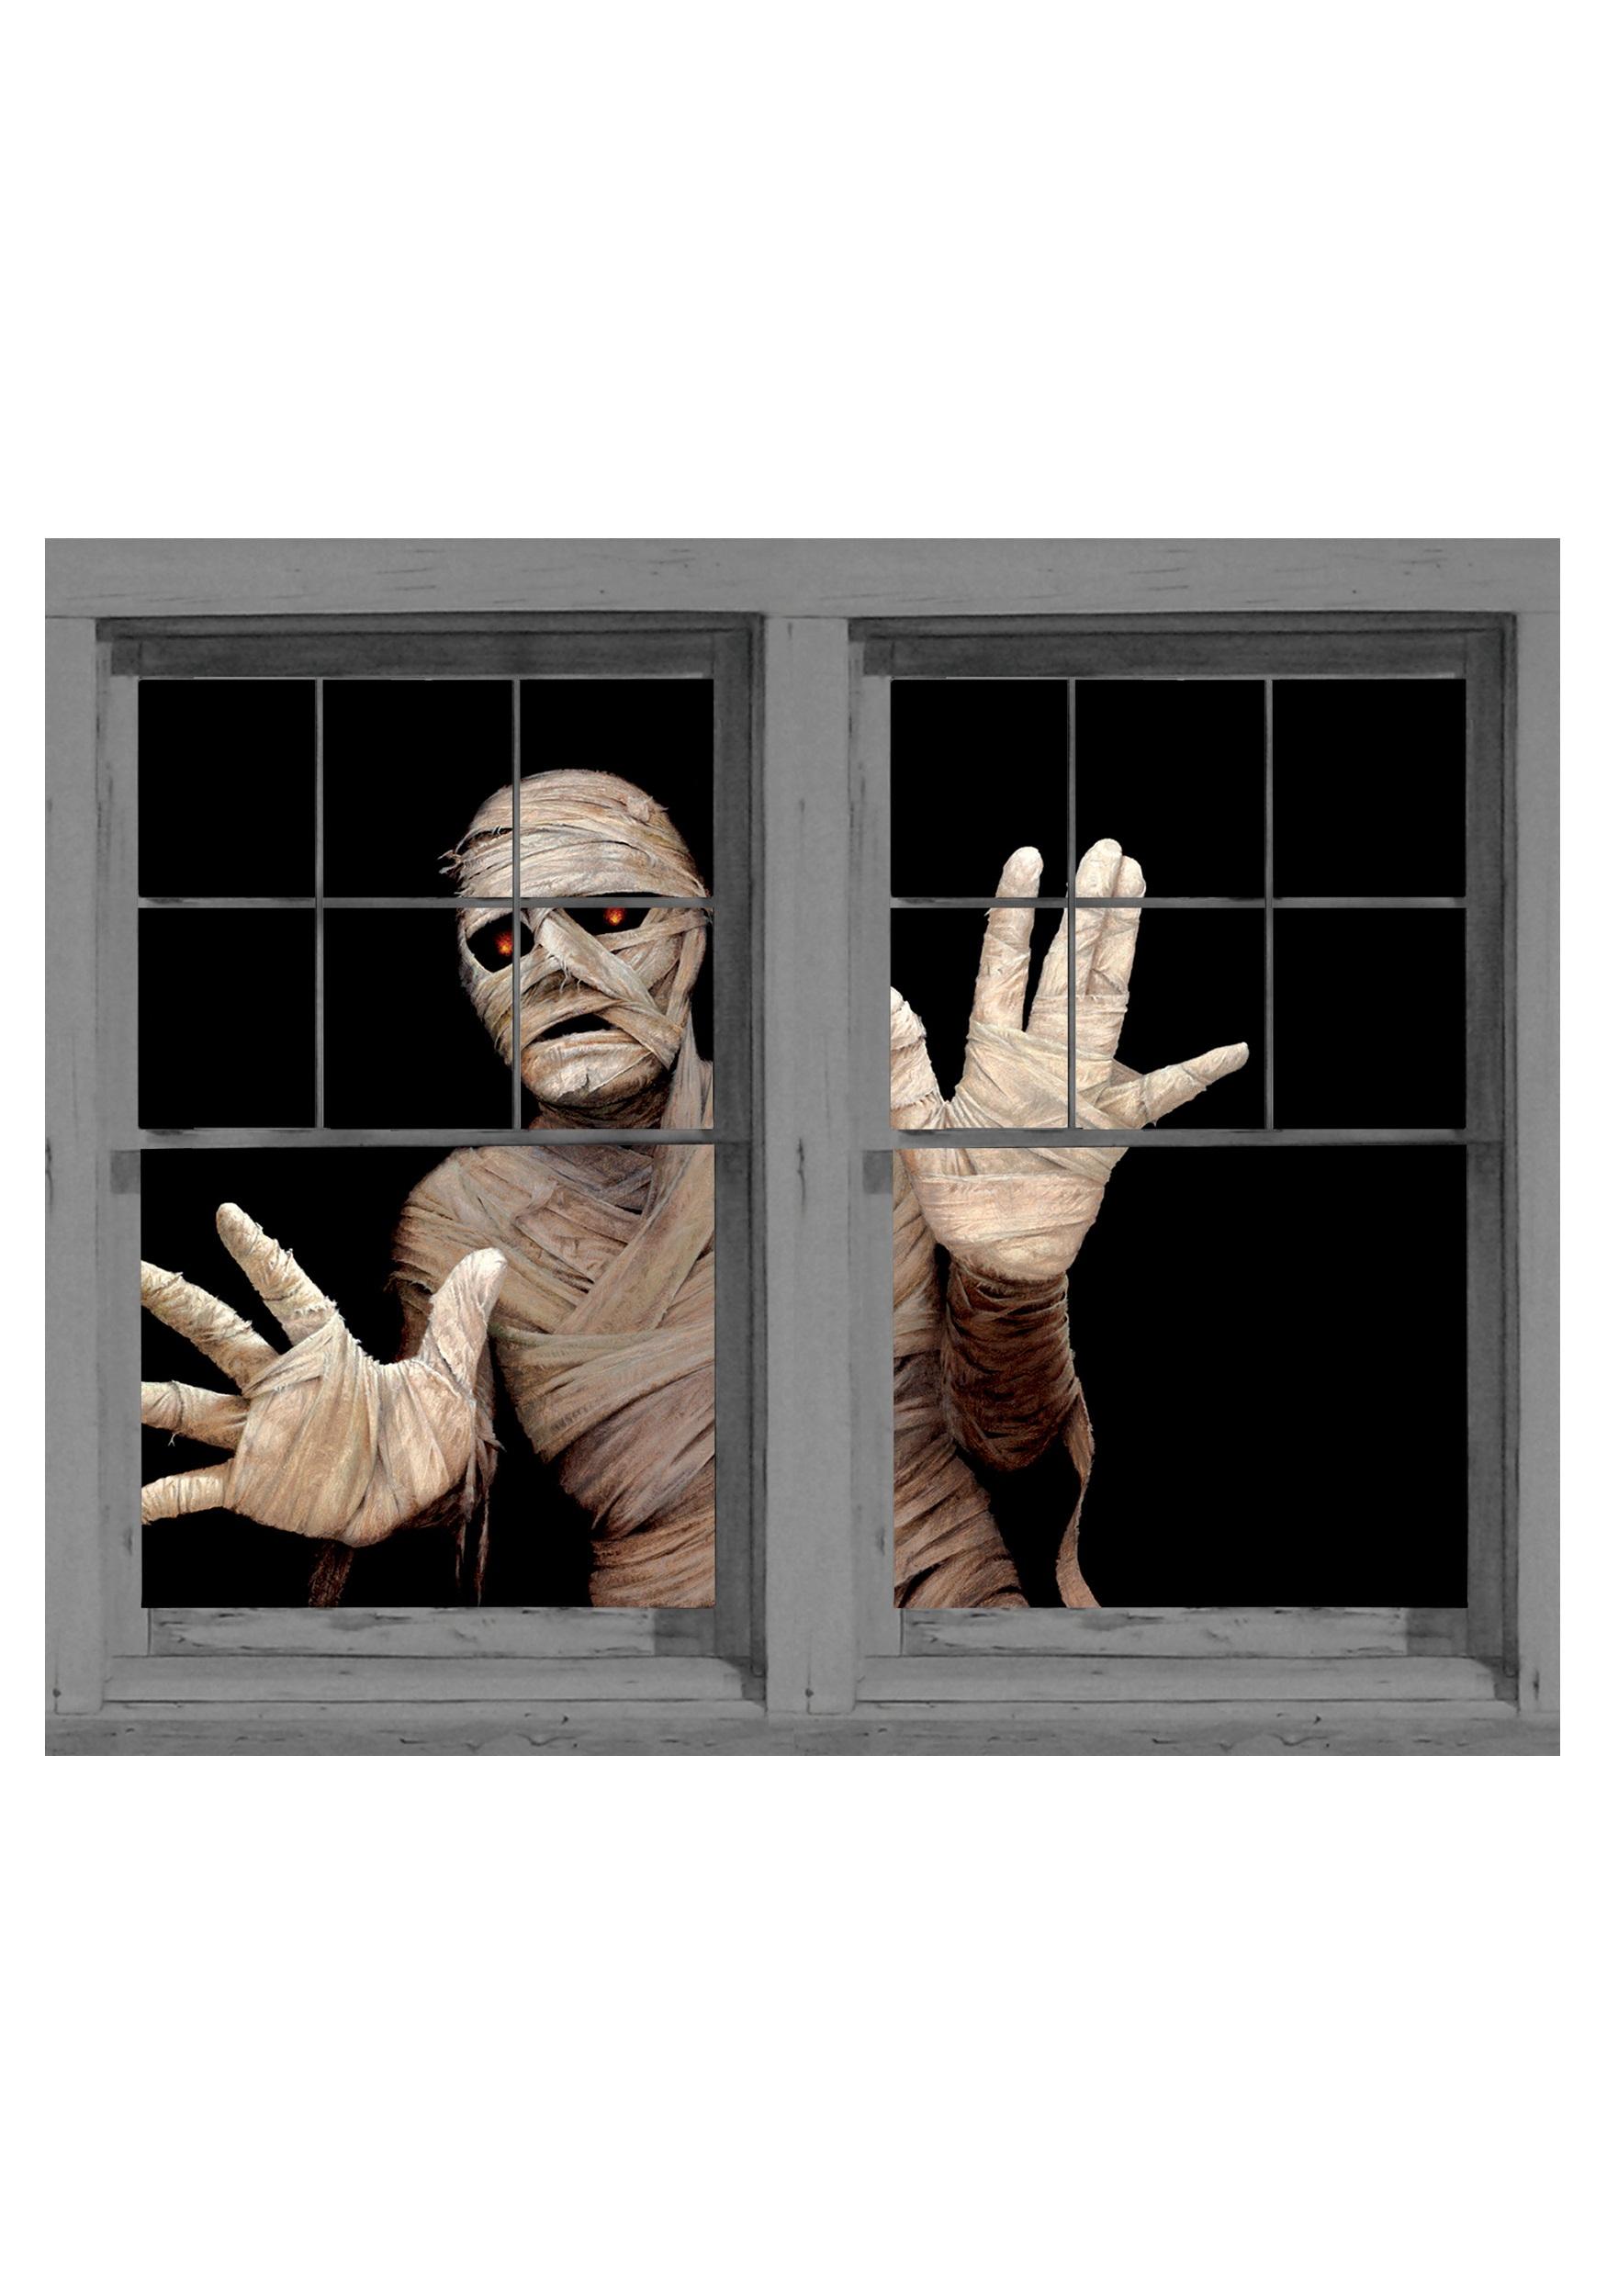 Egyptian Mummy Window Cling Scary Window Decorations